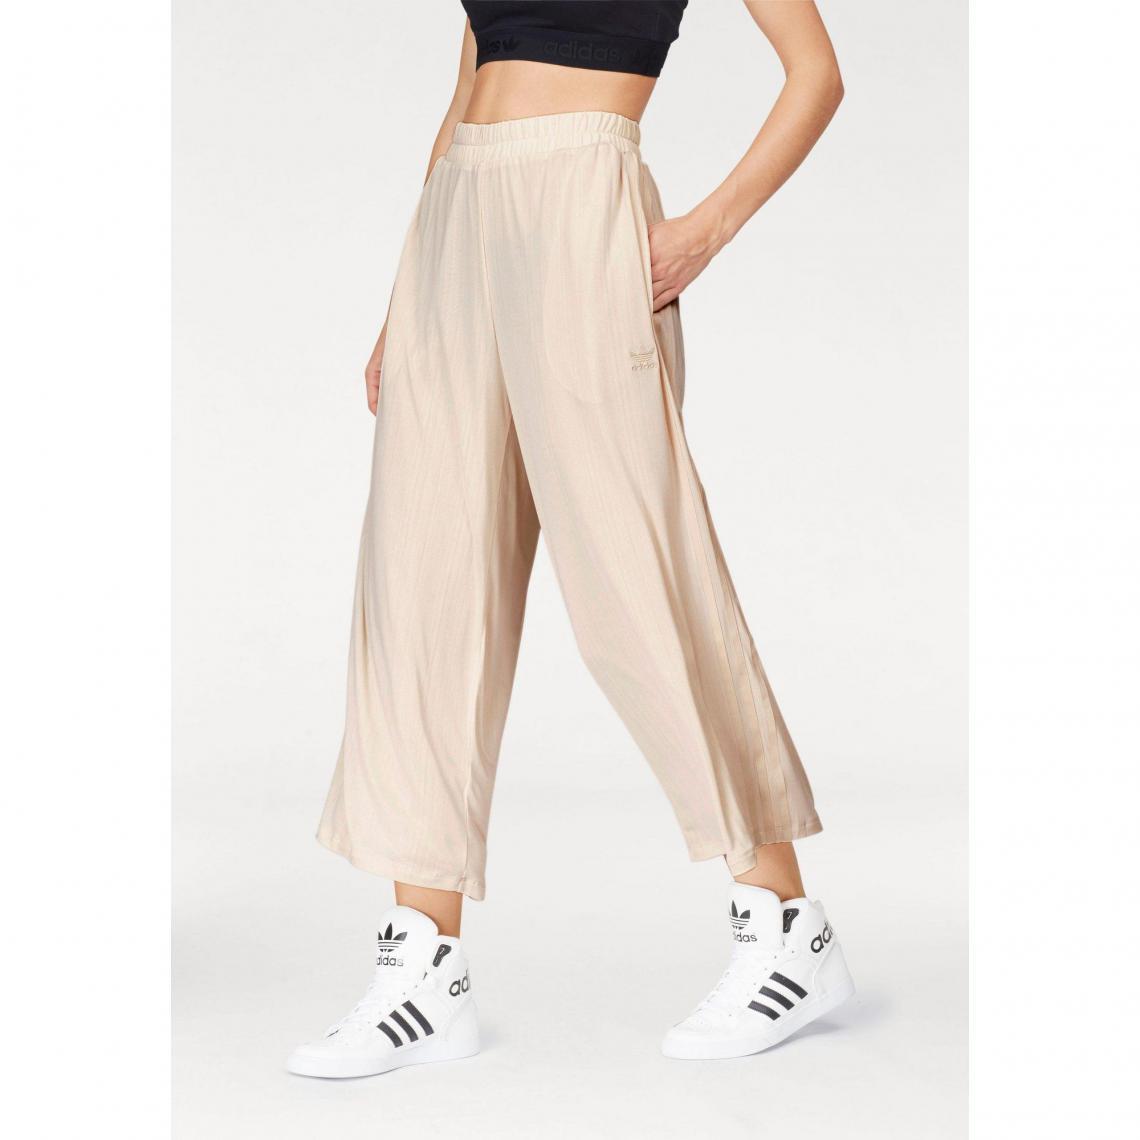 Pantalon de sport 7 8 femme Styling Complements Ribbed adidas Originals -  Nude Adidas Originals b18e100ce54